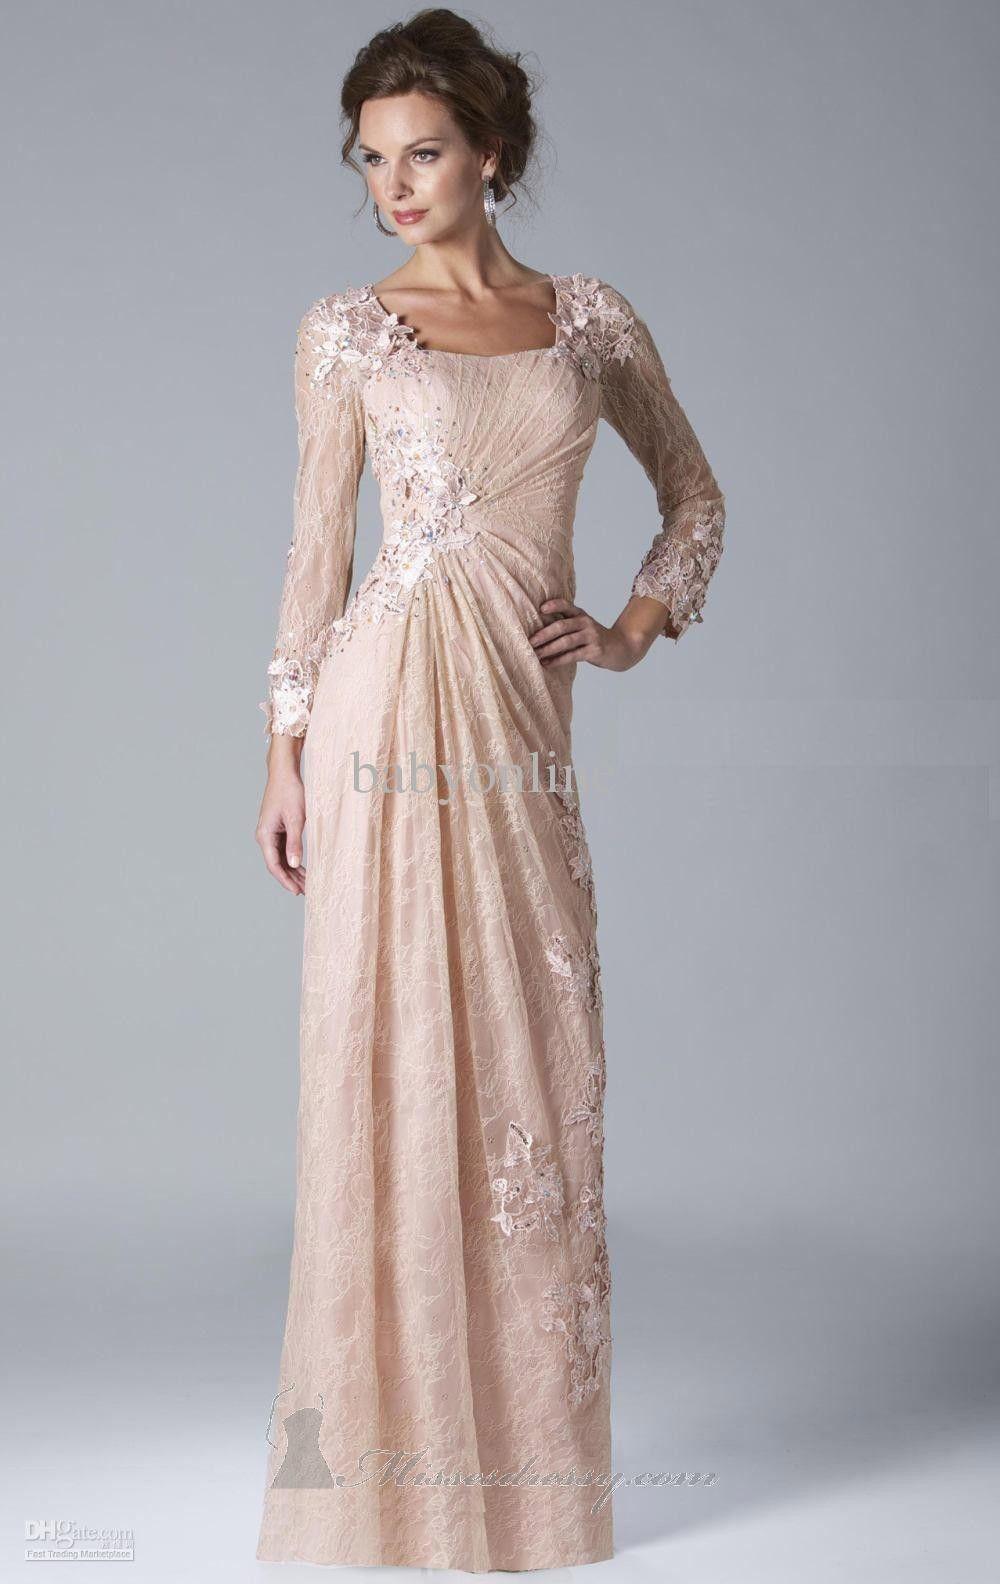 f4d9598f8c3 Stunning Long Formal Dresses for Women   Long Evening Dresses For Women  Long Sleeve Evening Dresses Dress Trends 2015